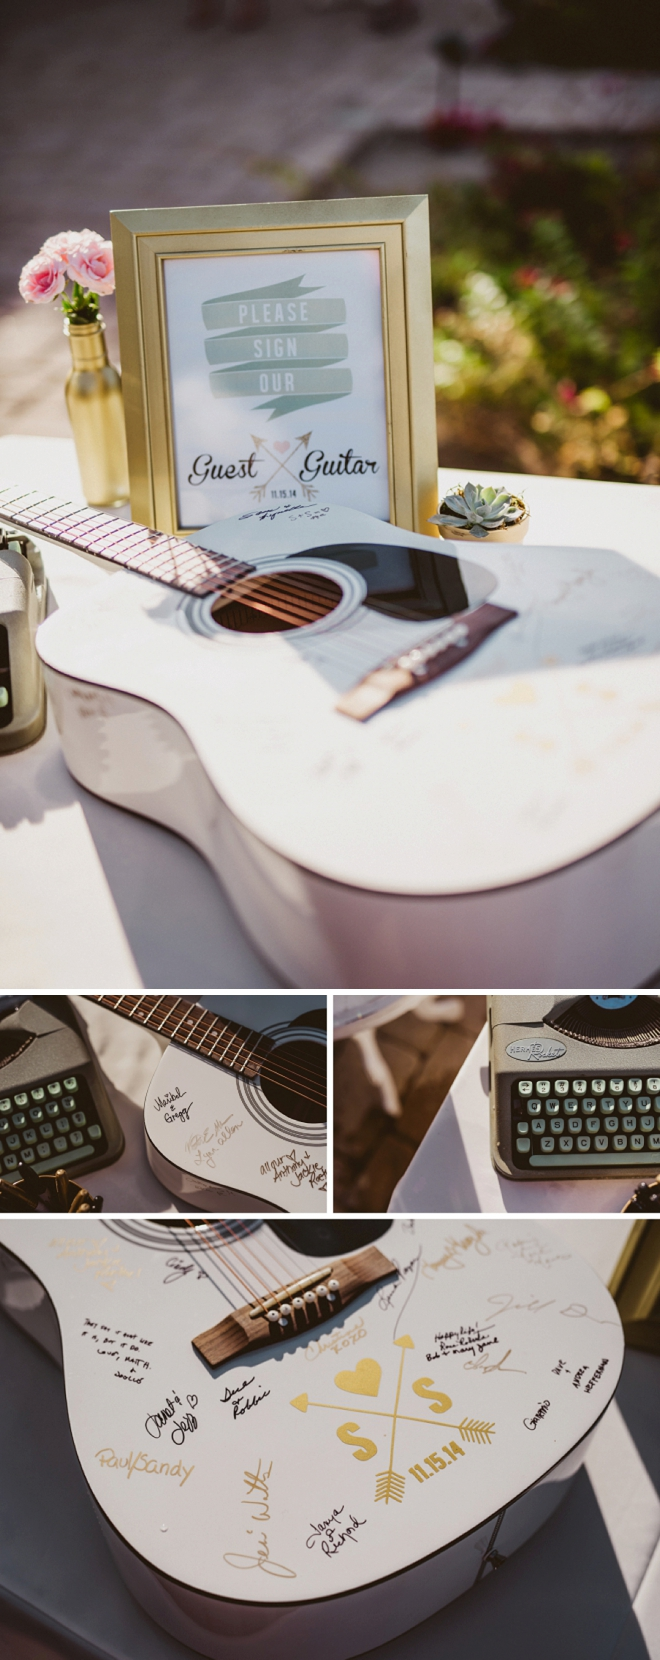 We love this fun couple's guitar guest book! Such a fun guest book idea!